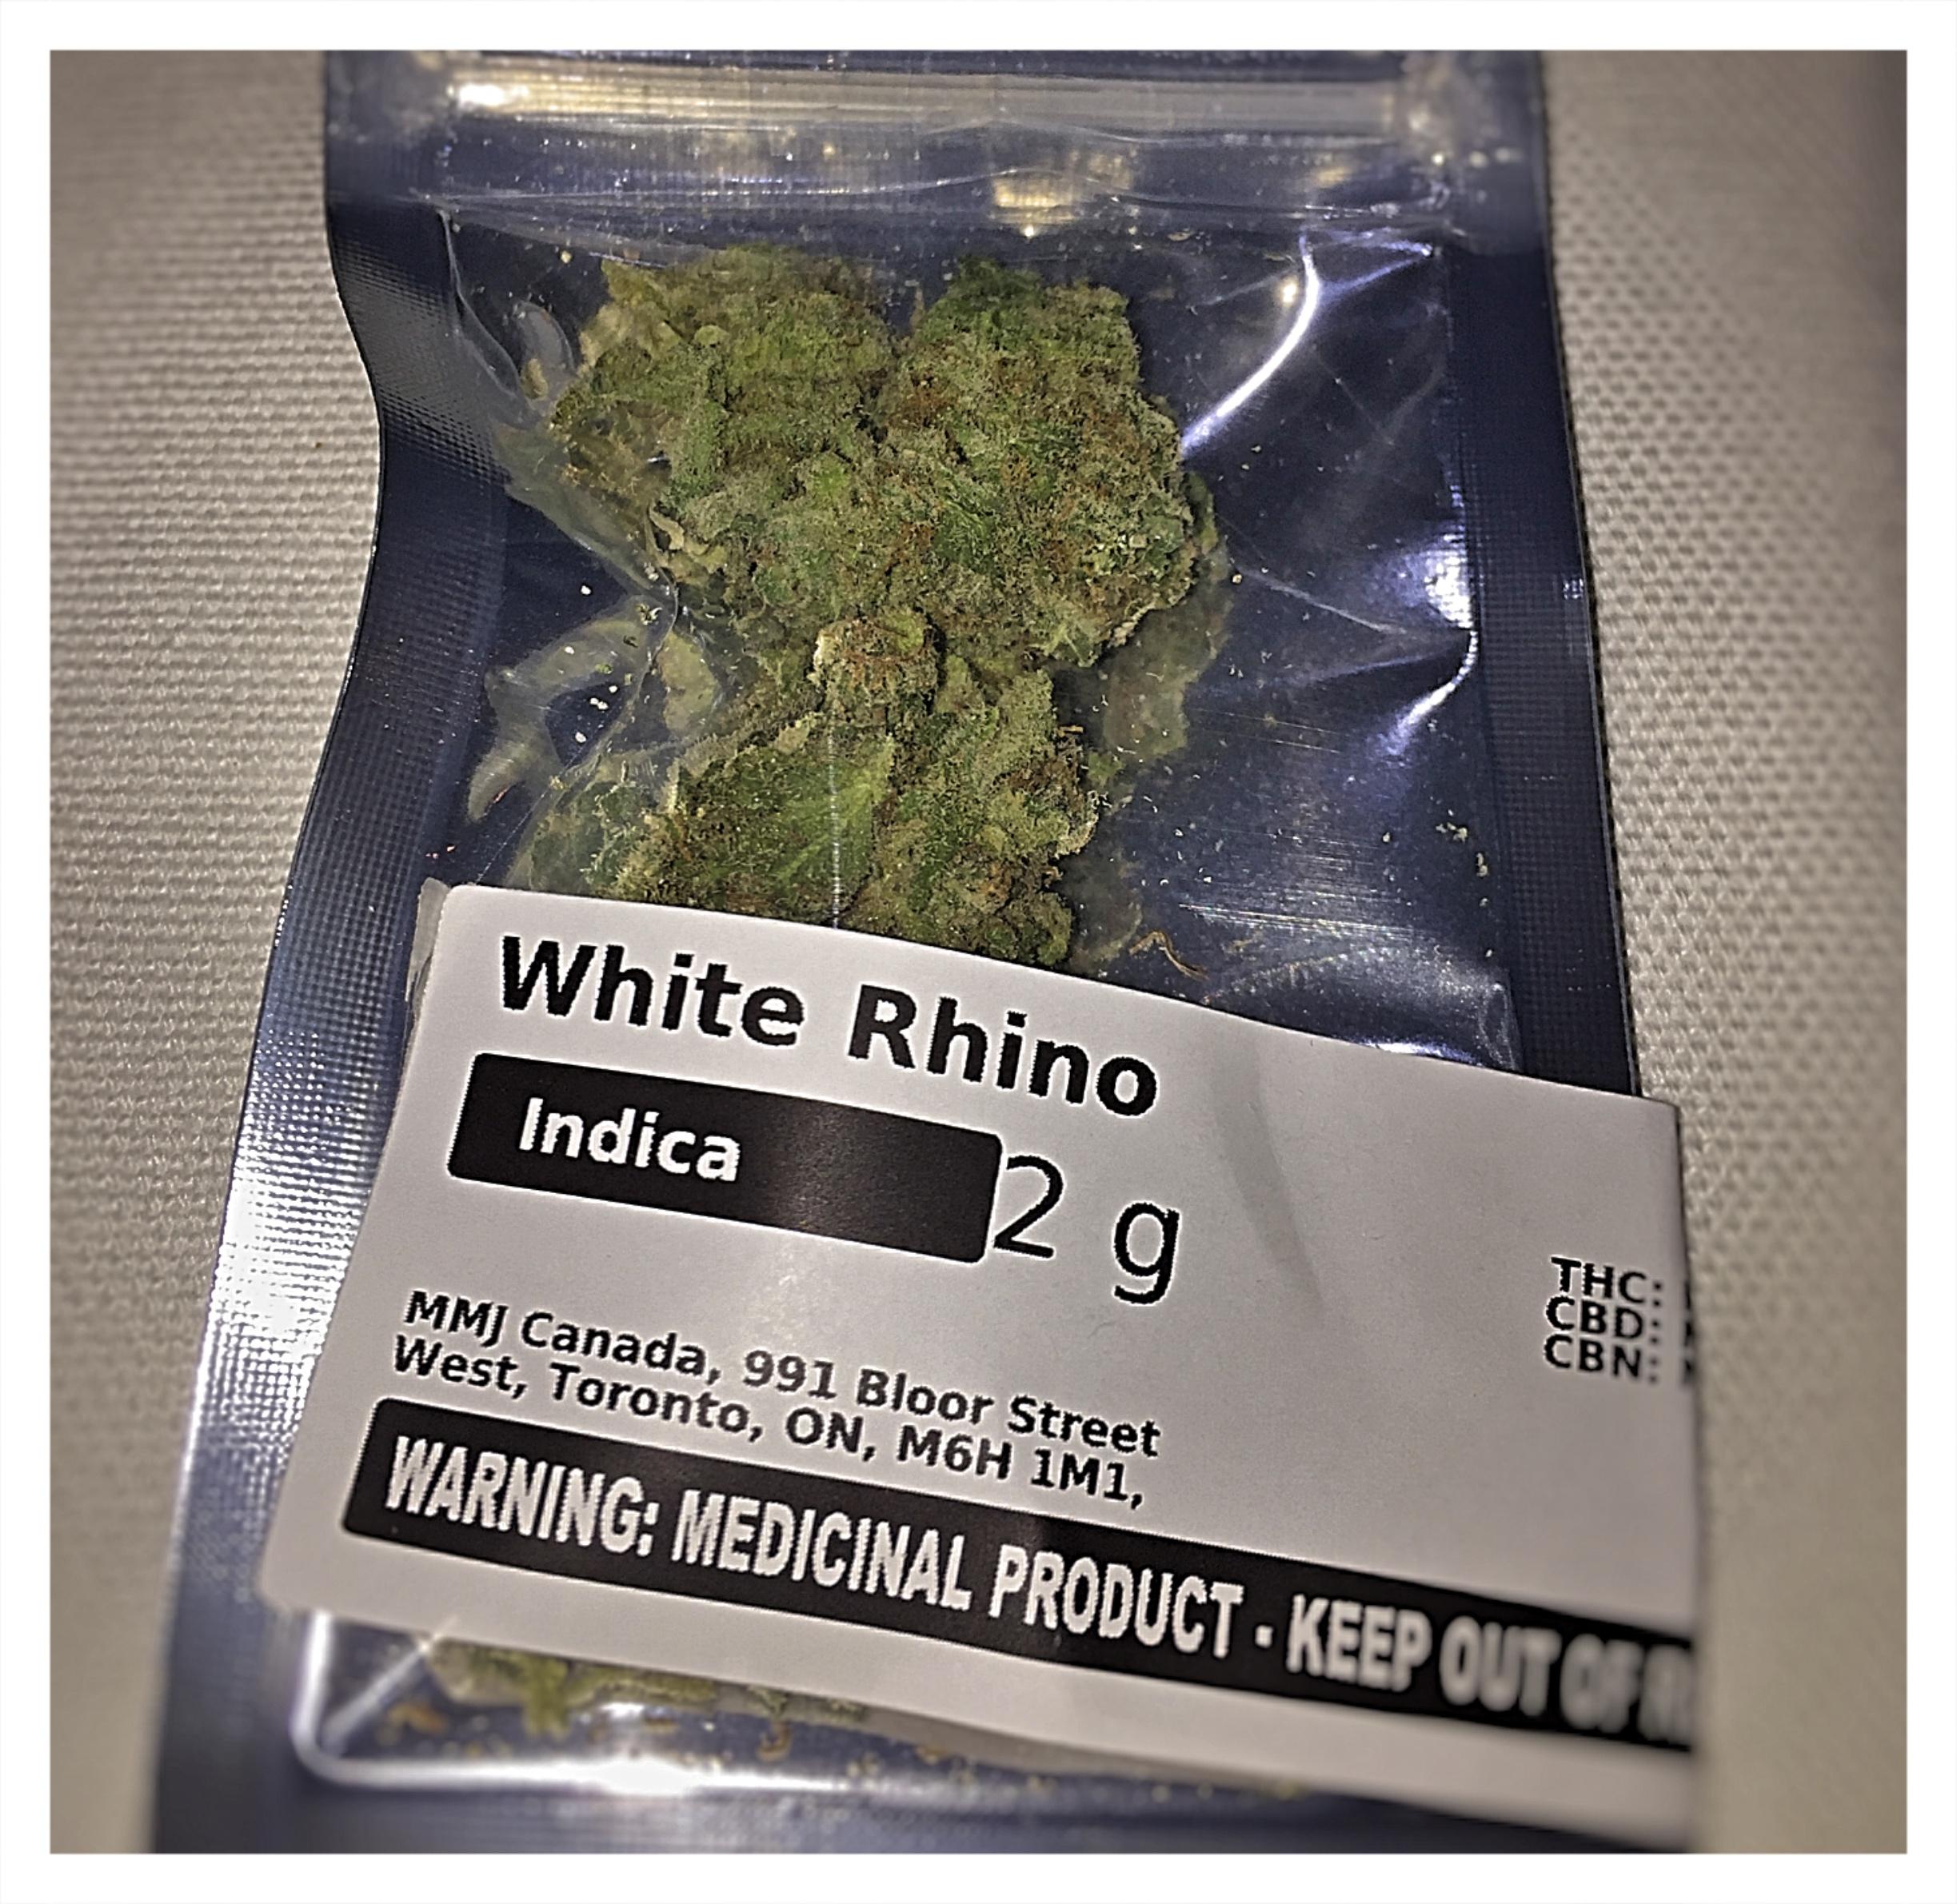 WhiteRhinoPost1